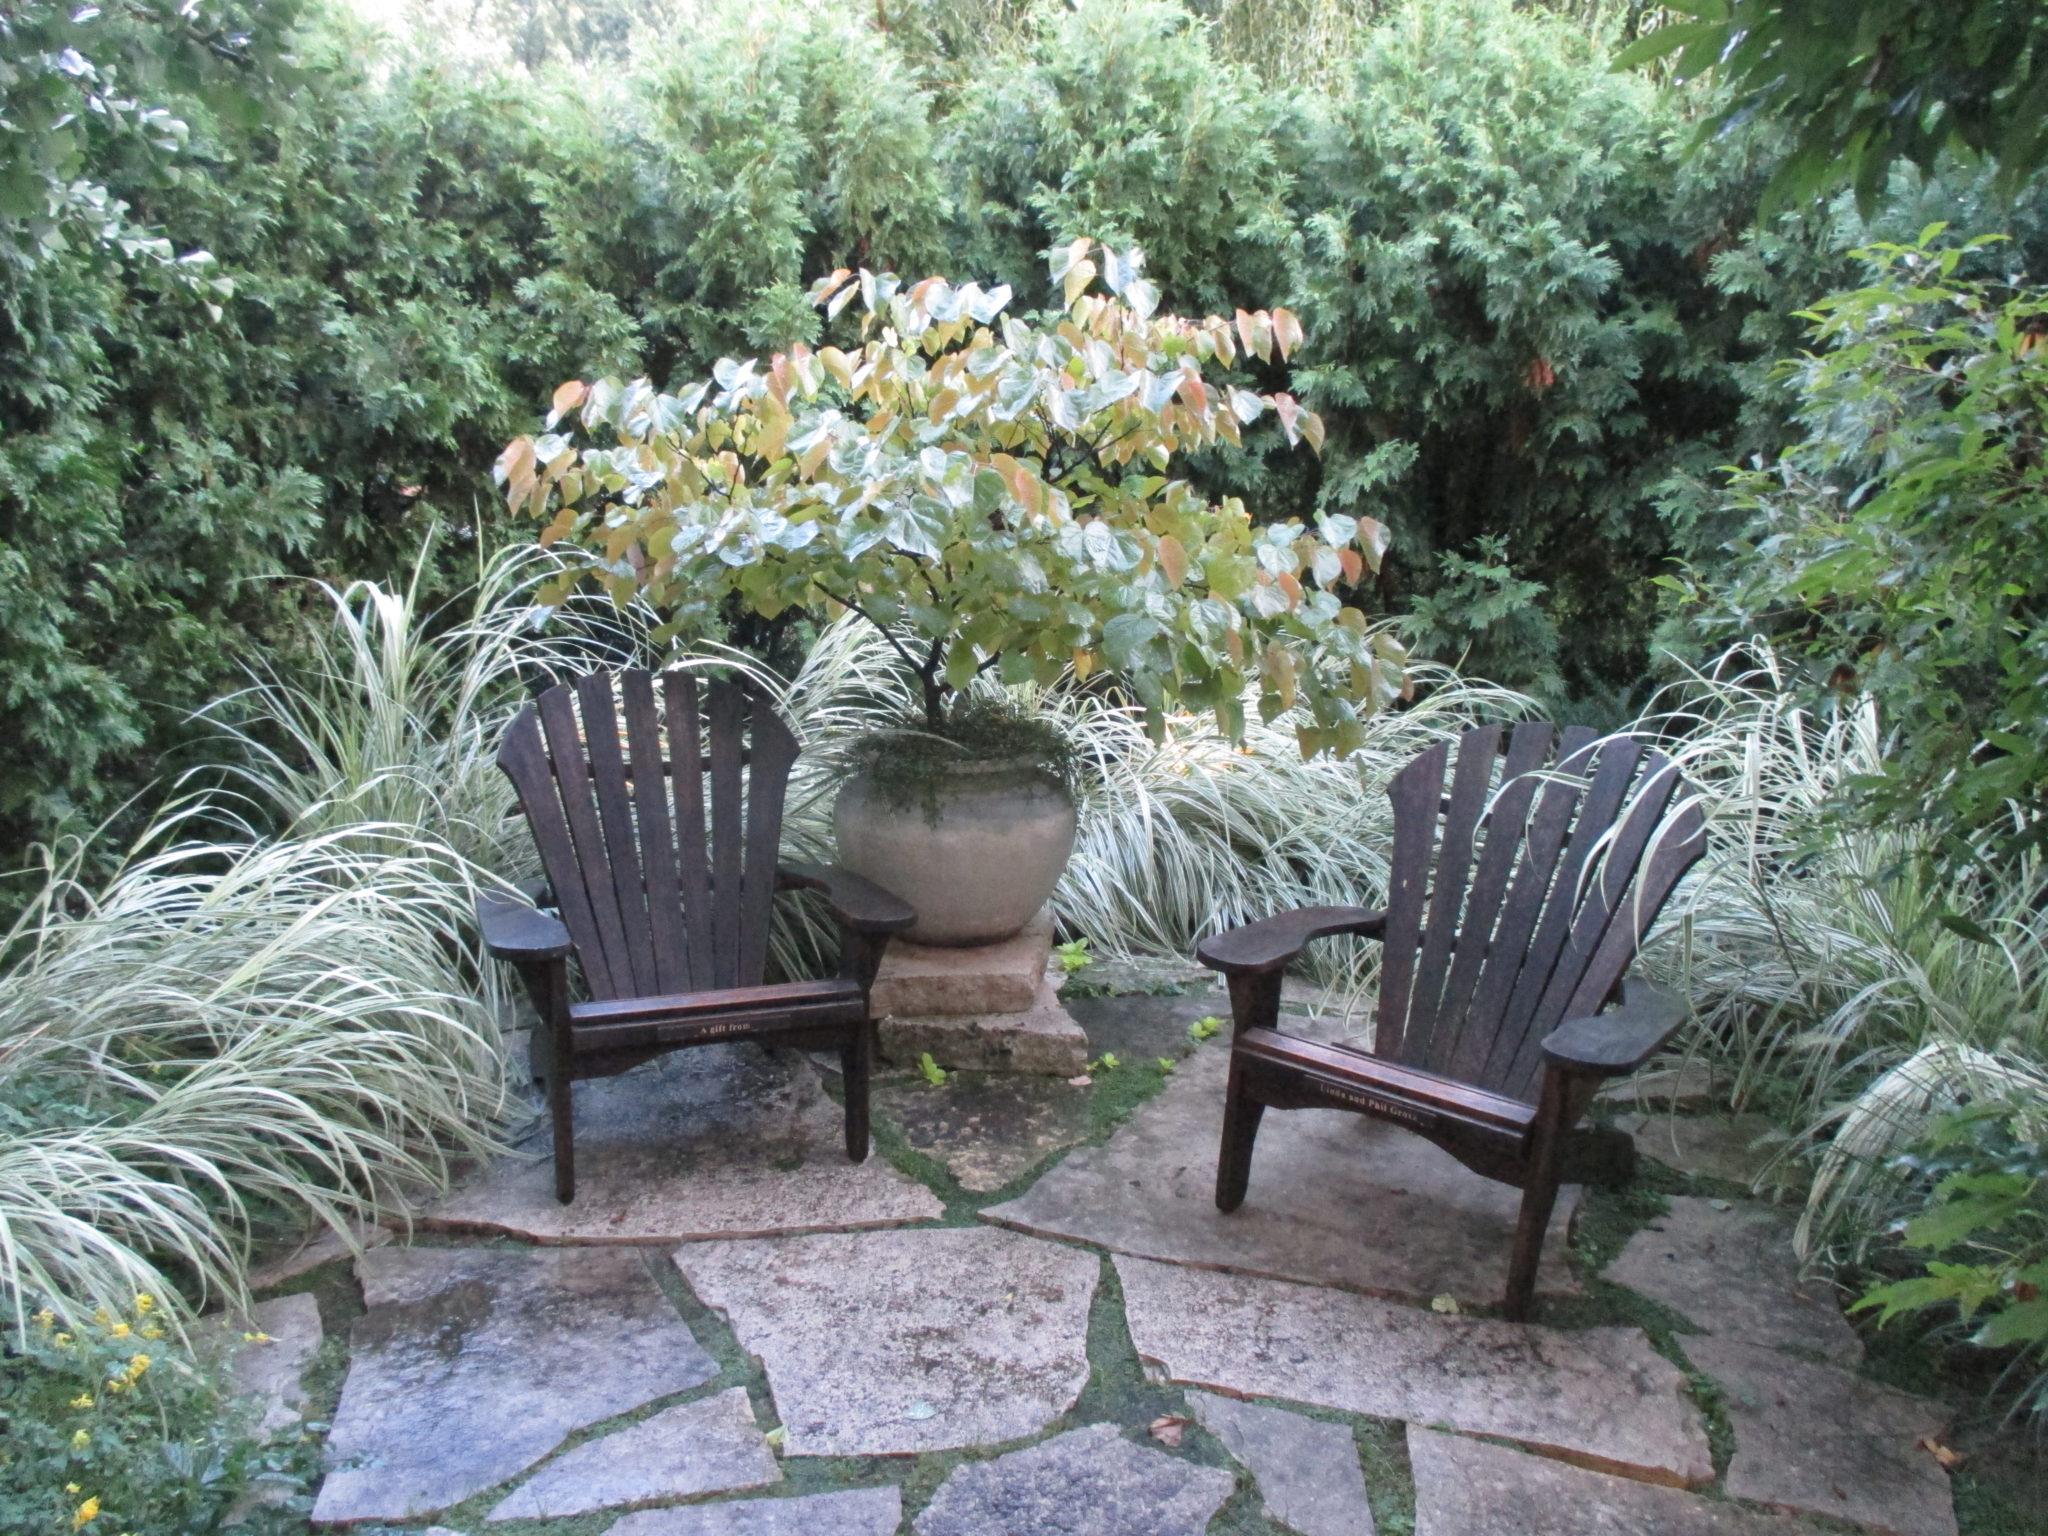 Recent Olbrich Visit Rotary Botanical Gardens